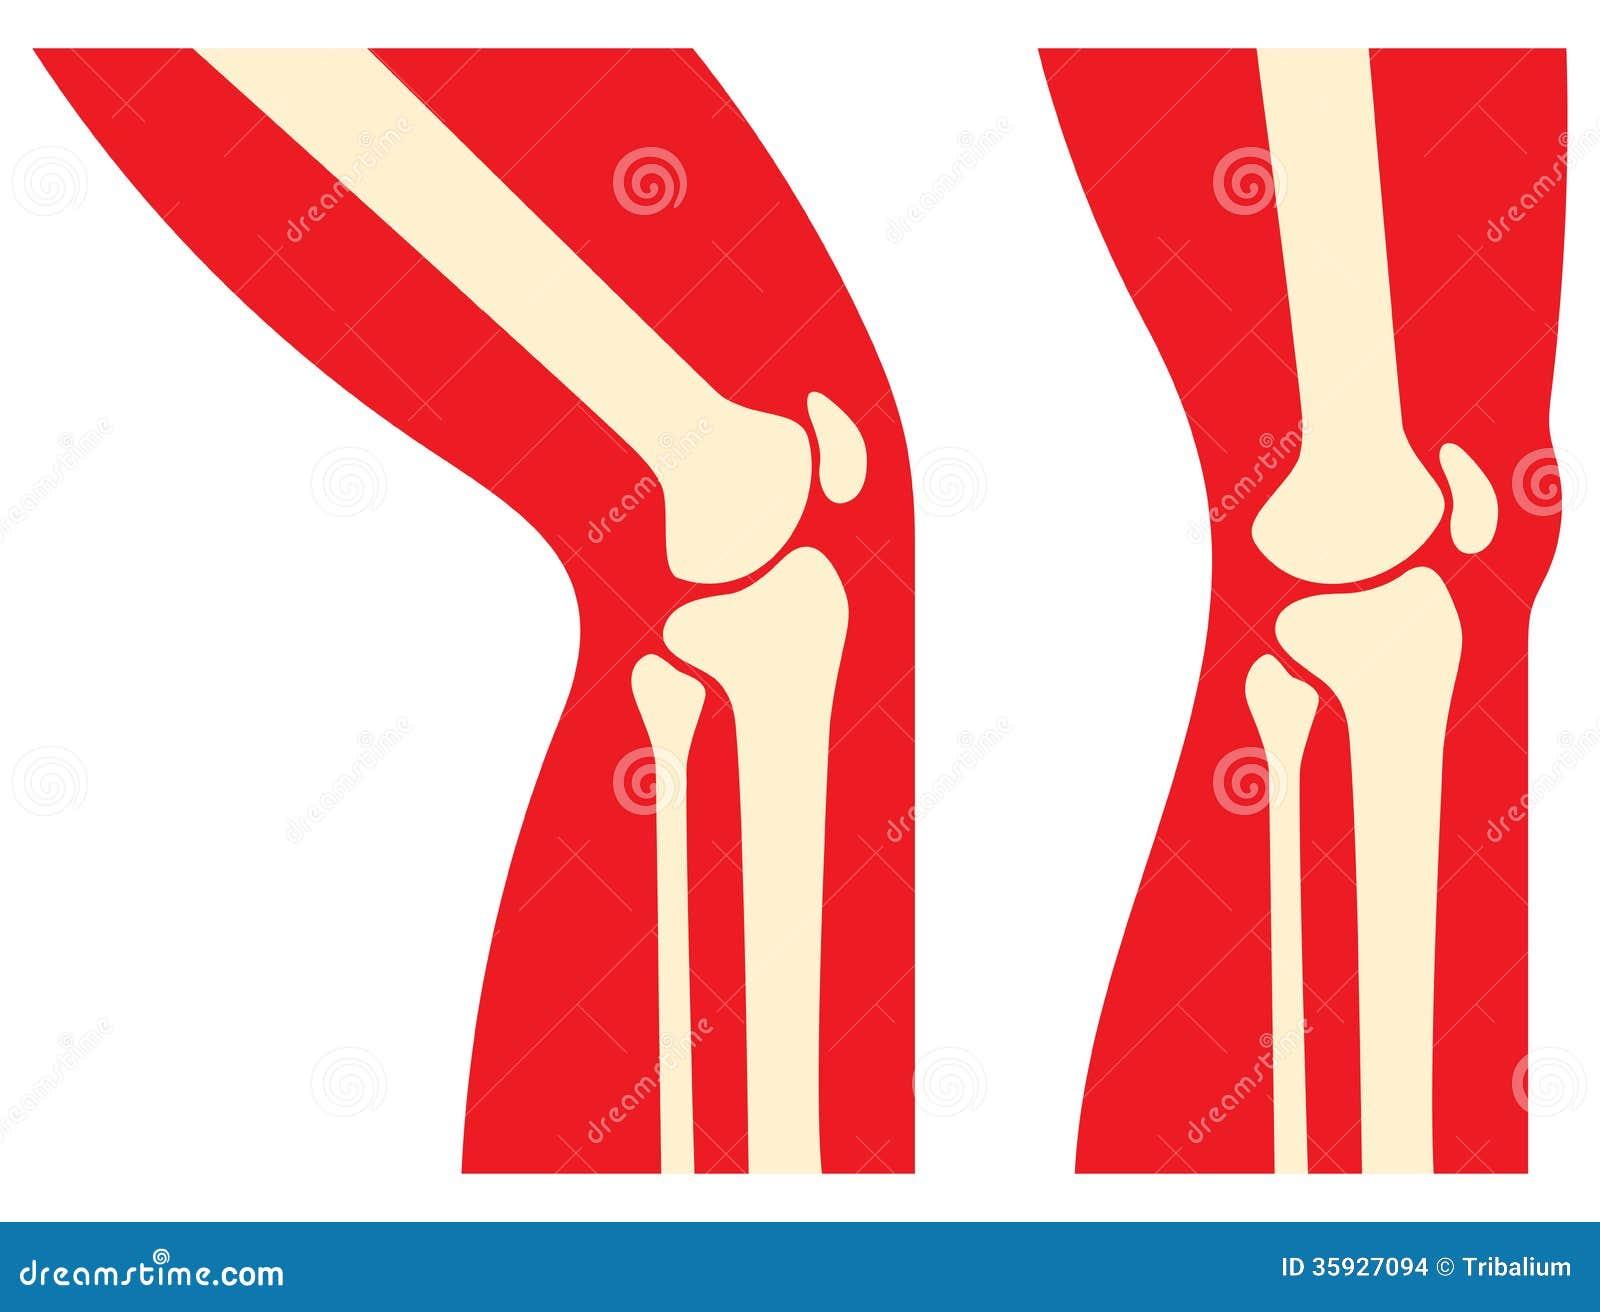 Knee anatomy stock photo image of operation health 35927094 knee anatomy ccuart Choice Image